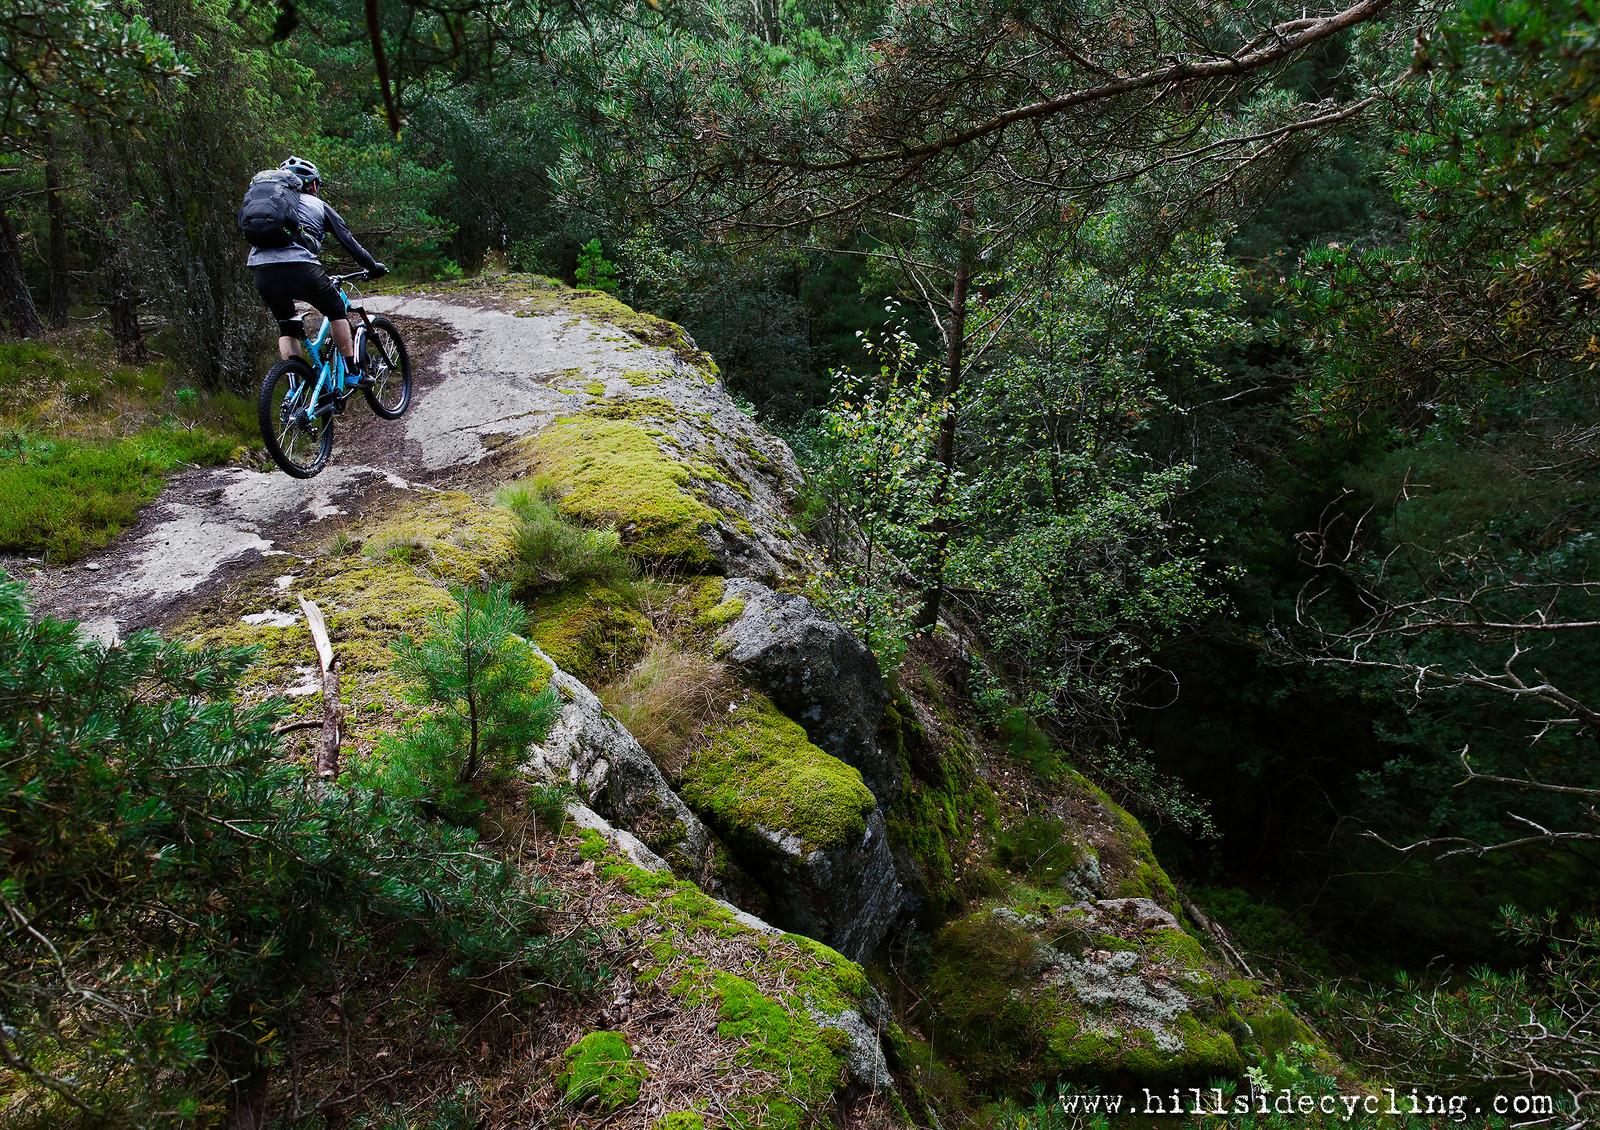 The Edge - Hillside Cycling - Mountain Biking Pictures - Vital MTB